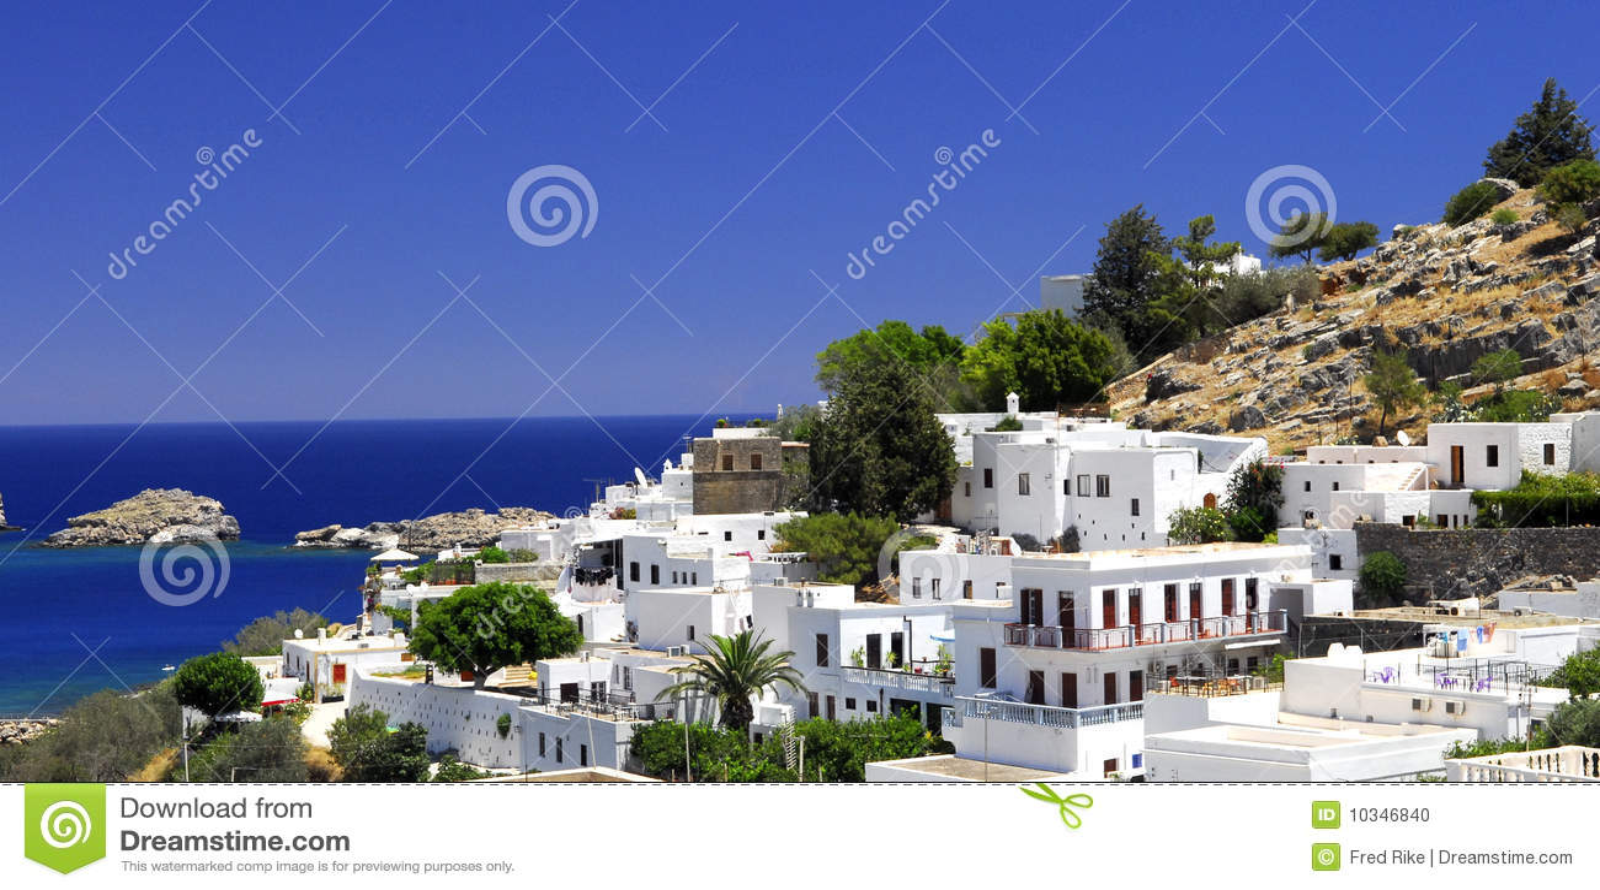 希腊lindos老城镇